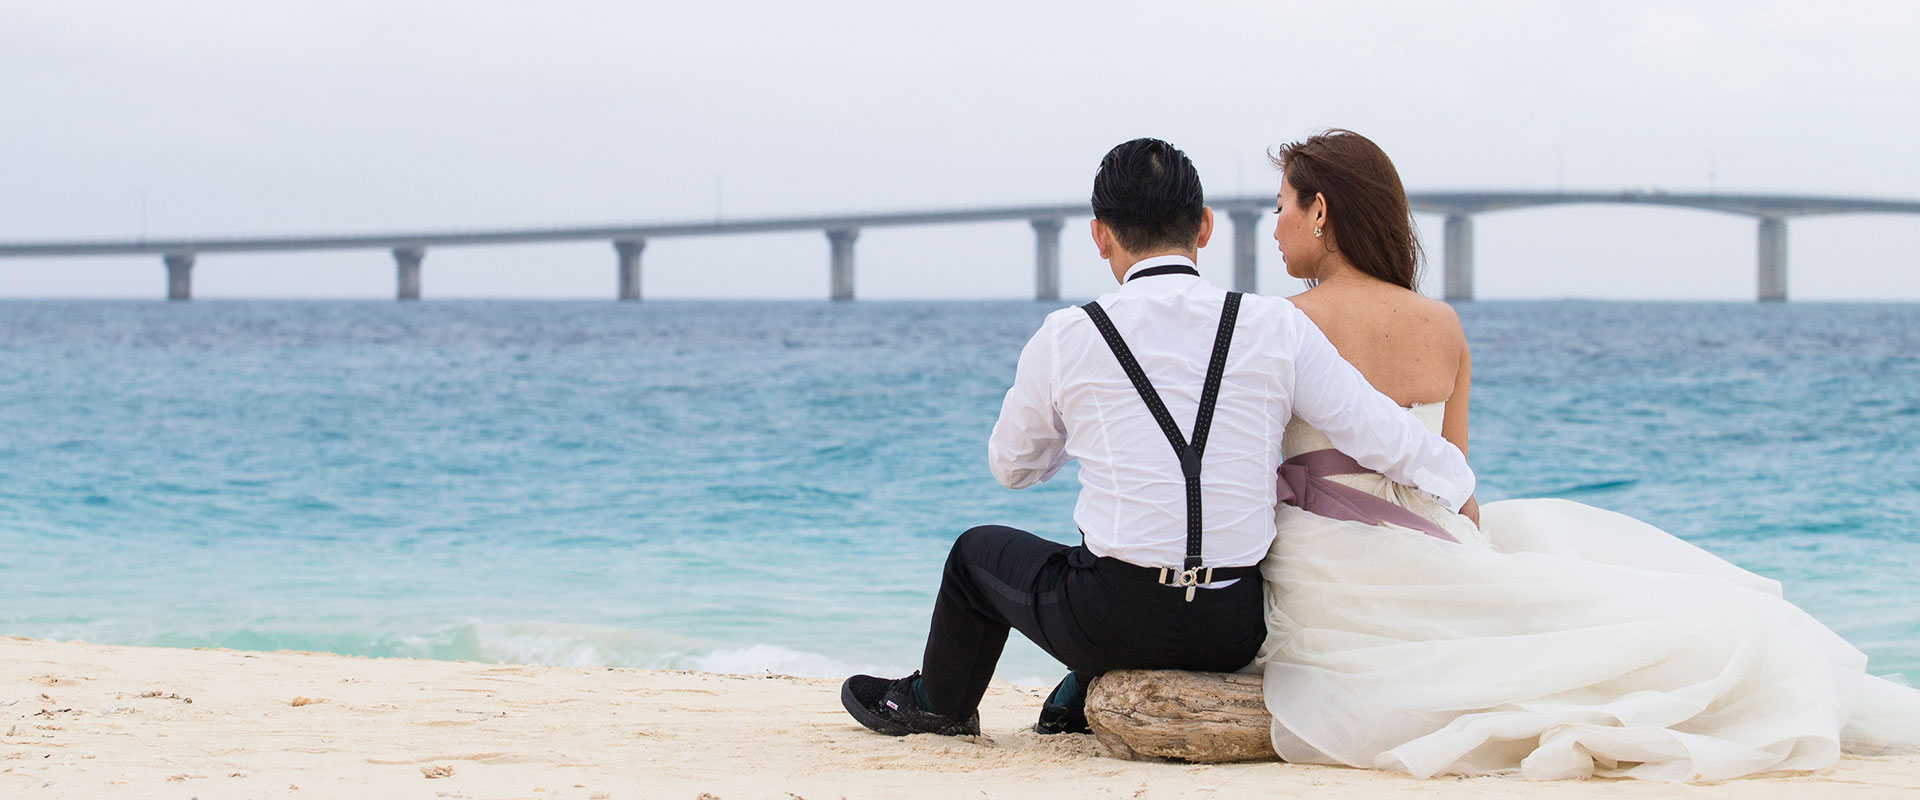 Resort Wedding - 宮古島 -